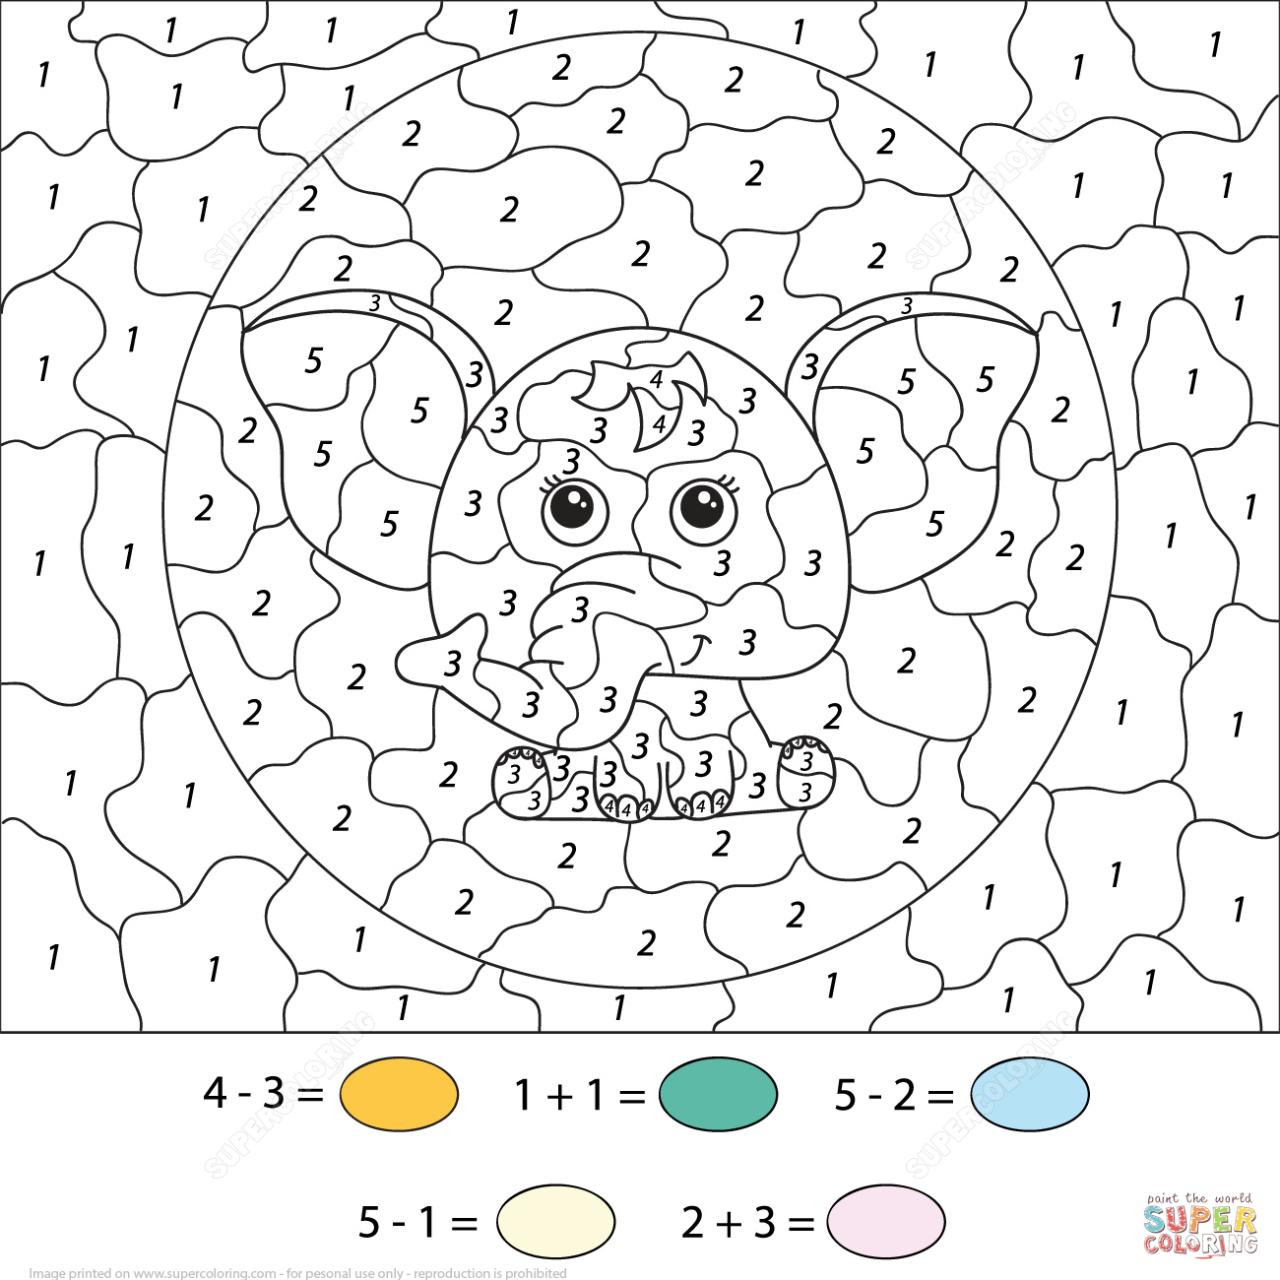 Coloring ~ Colornumber Math Worksheets Authenticlour Numbers | Printable Color By Number Math Worksheets